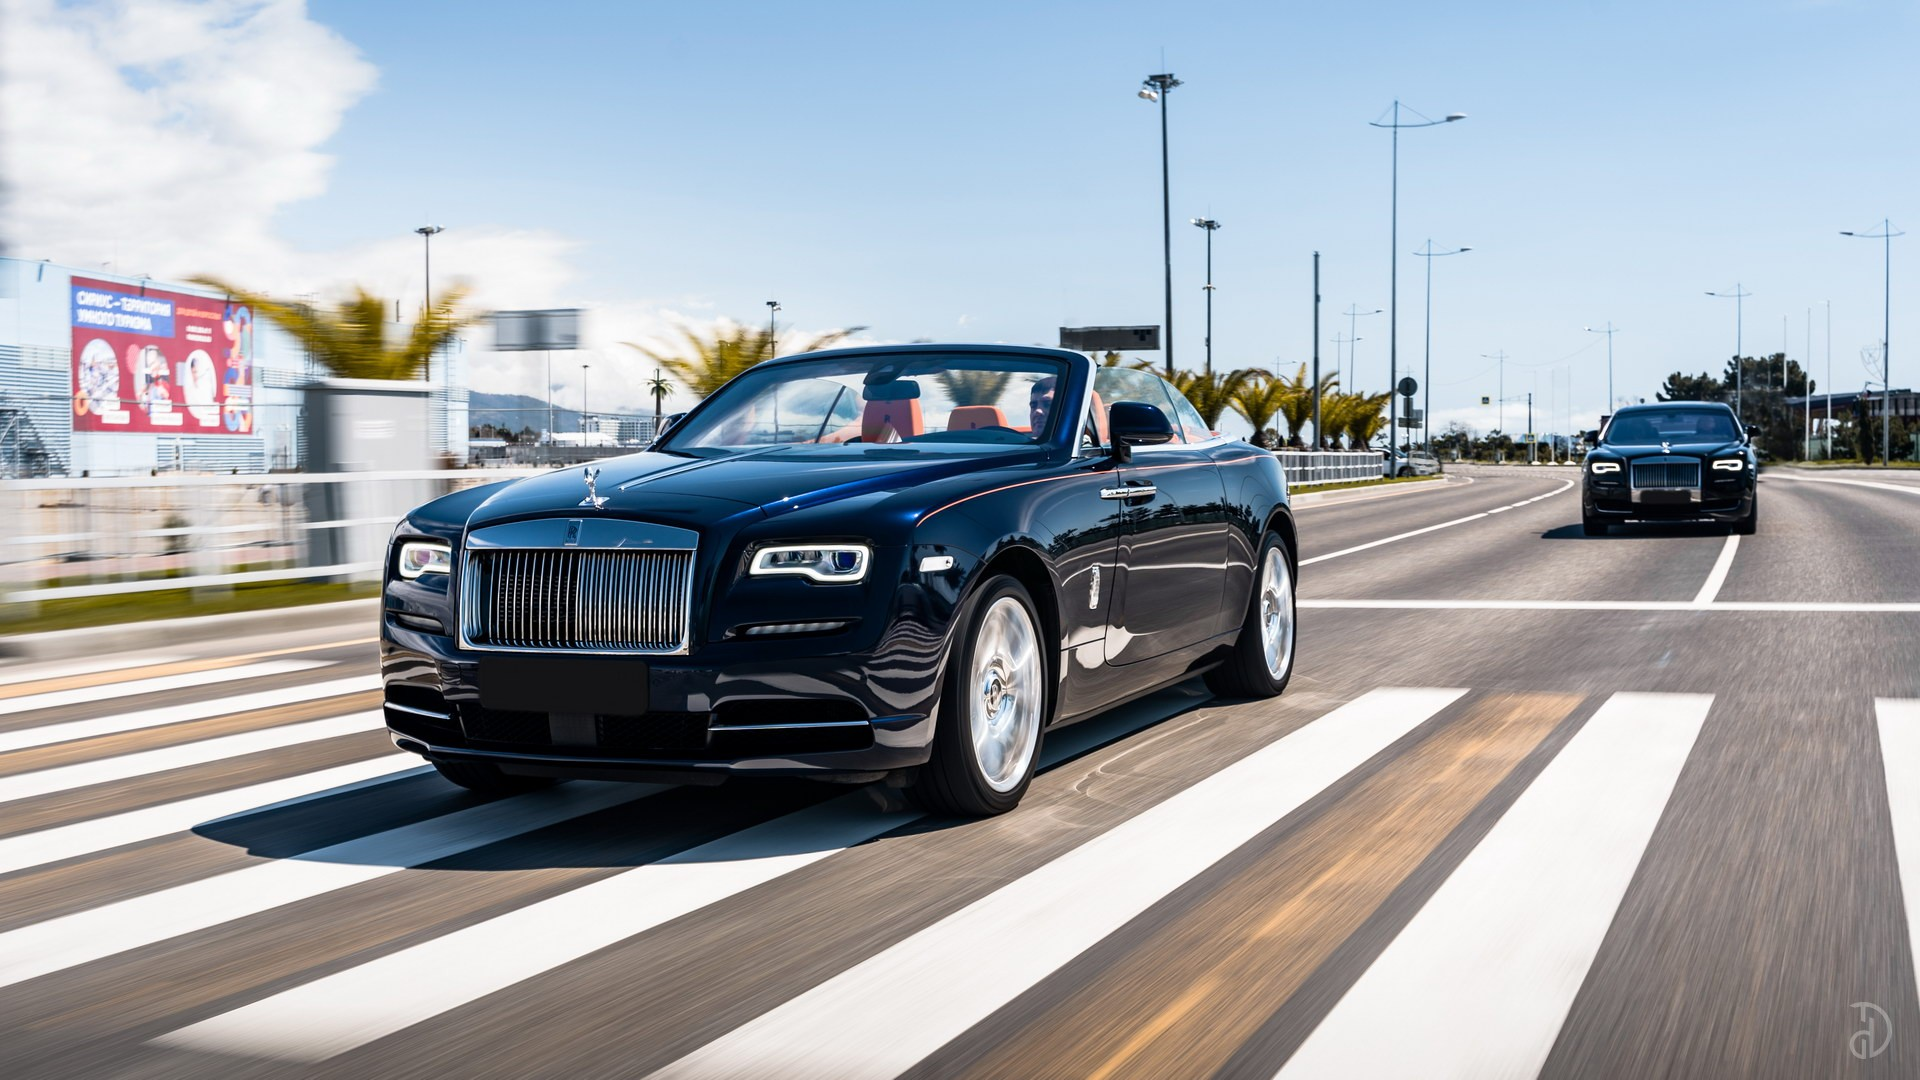 Аренда Rolls-Royce Dawn в Сочи. Фото 1